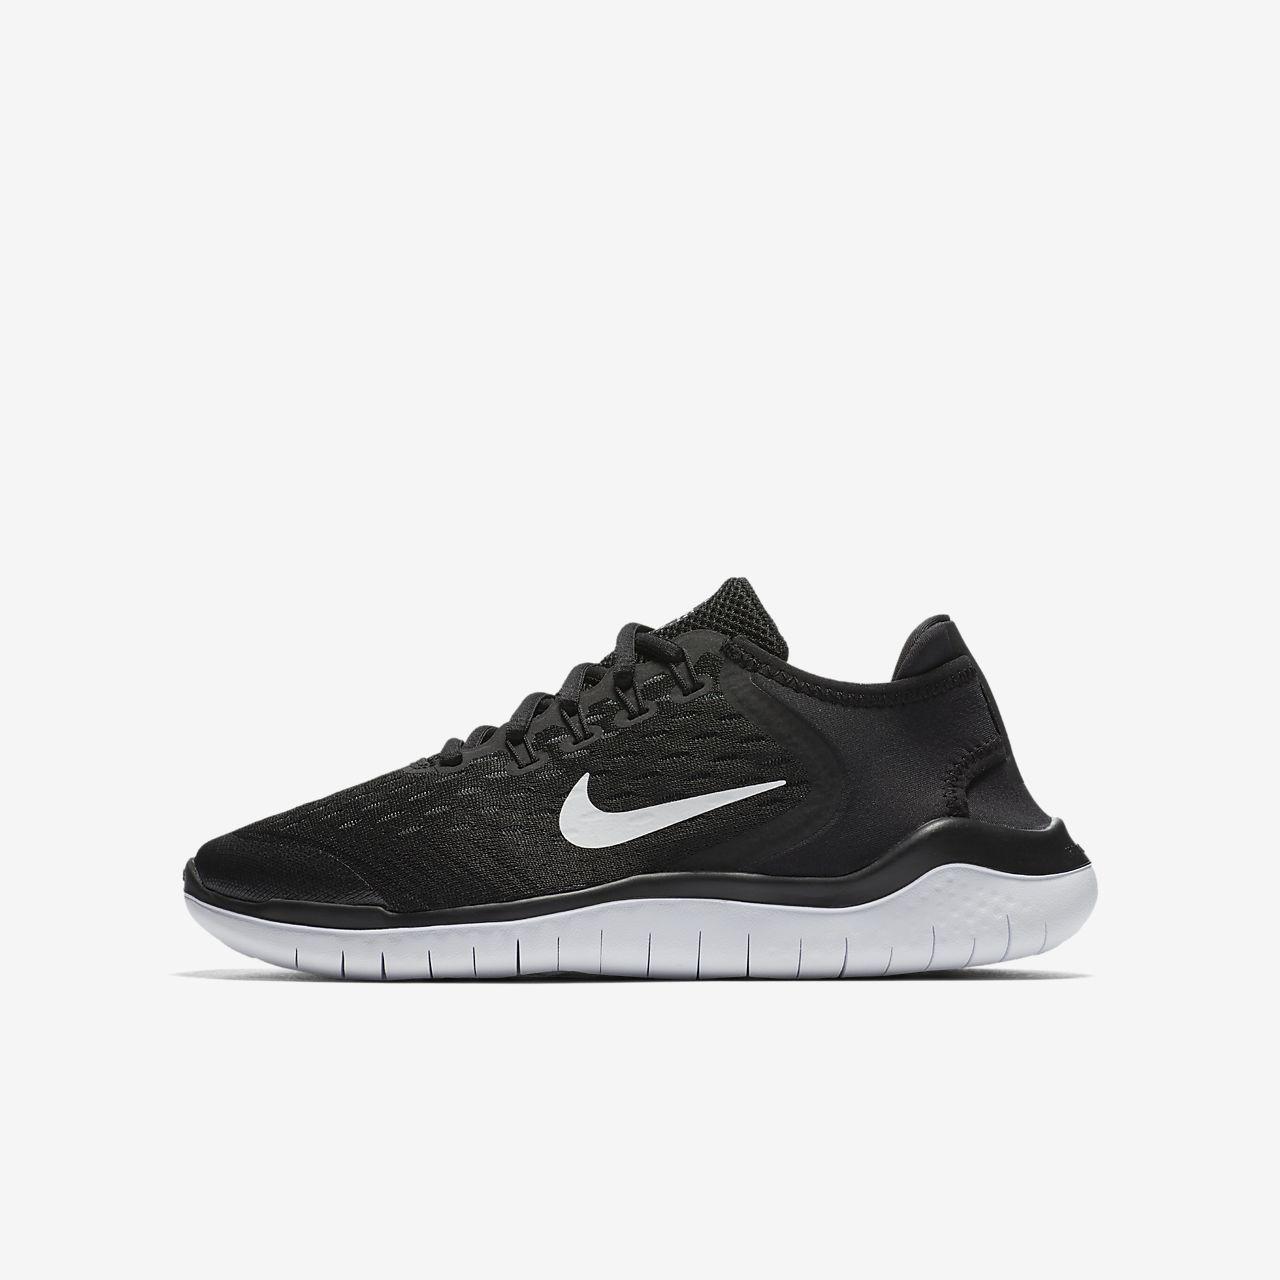 2f4179a0c4 Nike Free RN 2018 Older Kids' Running Shoe. Nike.com AU